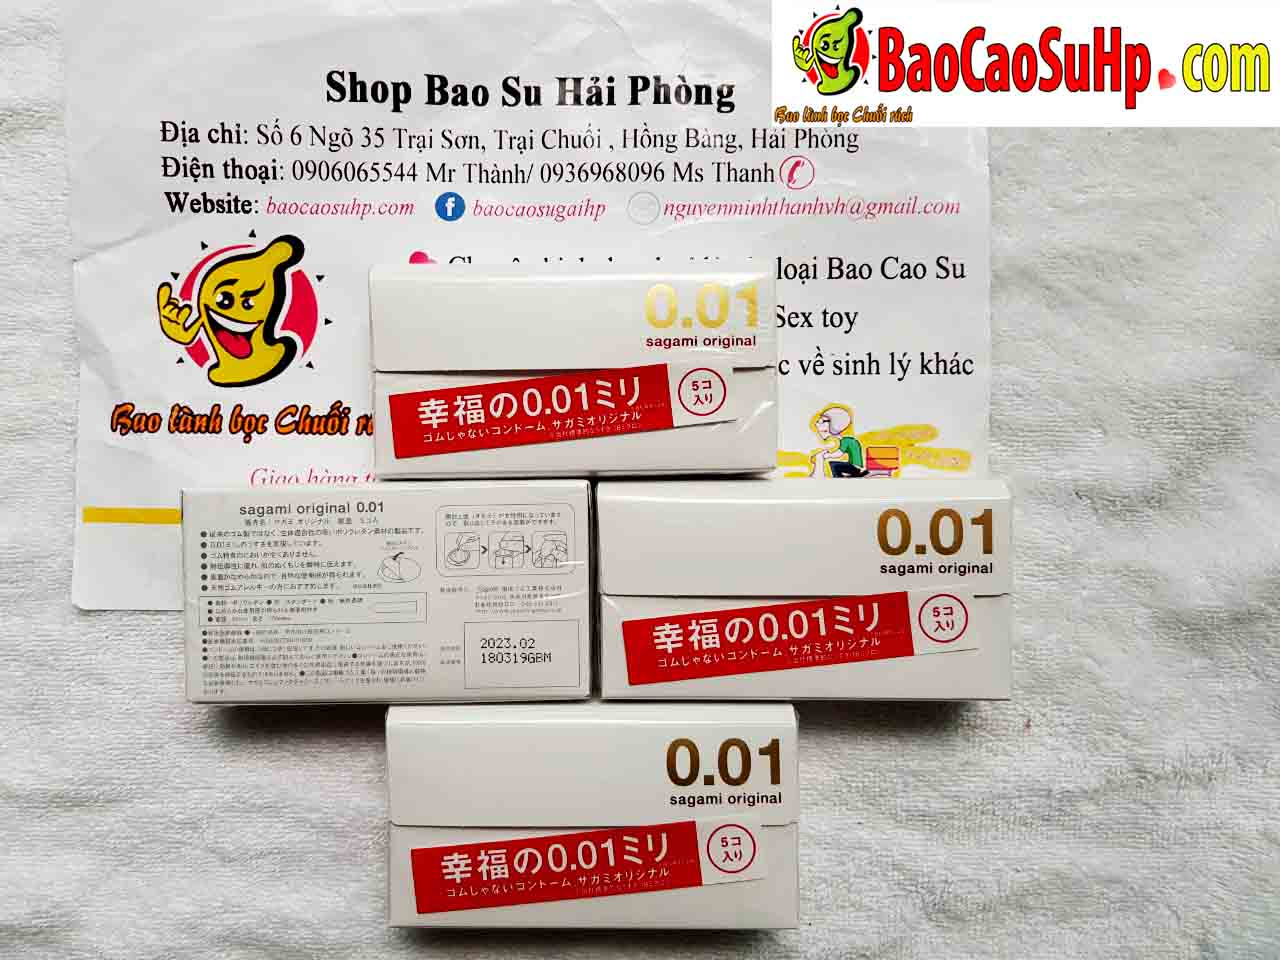 20200322083703 3070606 bao cao su nhat ban sagami original 001 - Bao cao su sagami Original 0,01 mỏng nhất thế giới giá rẻ